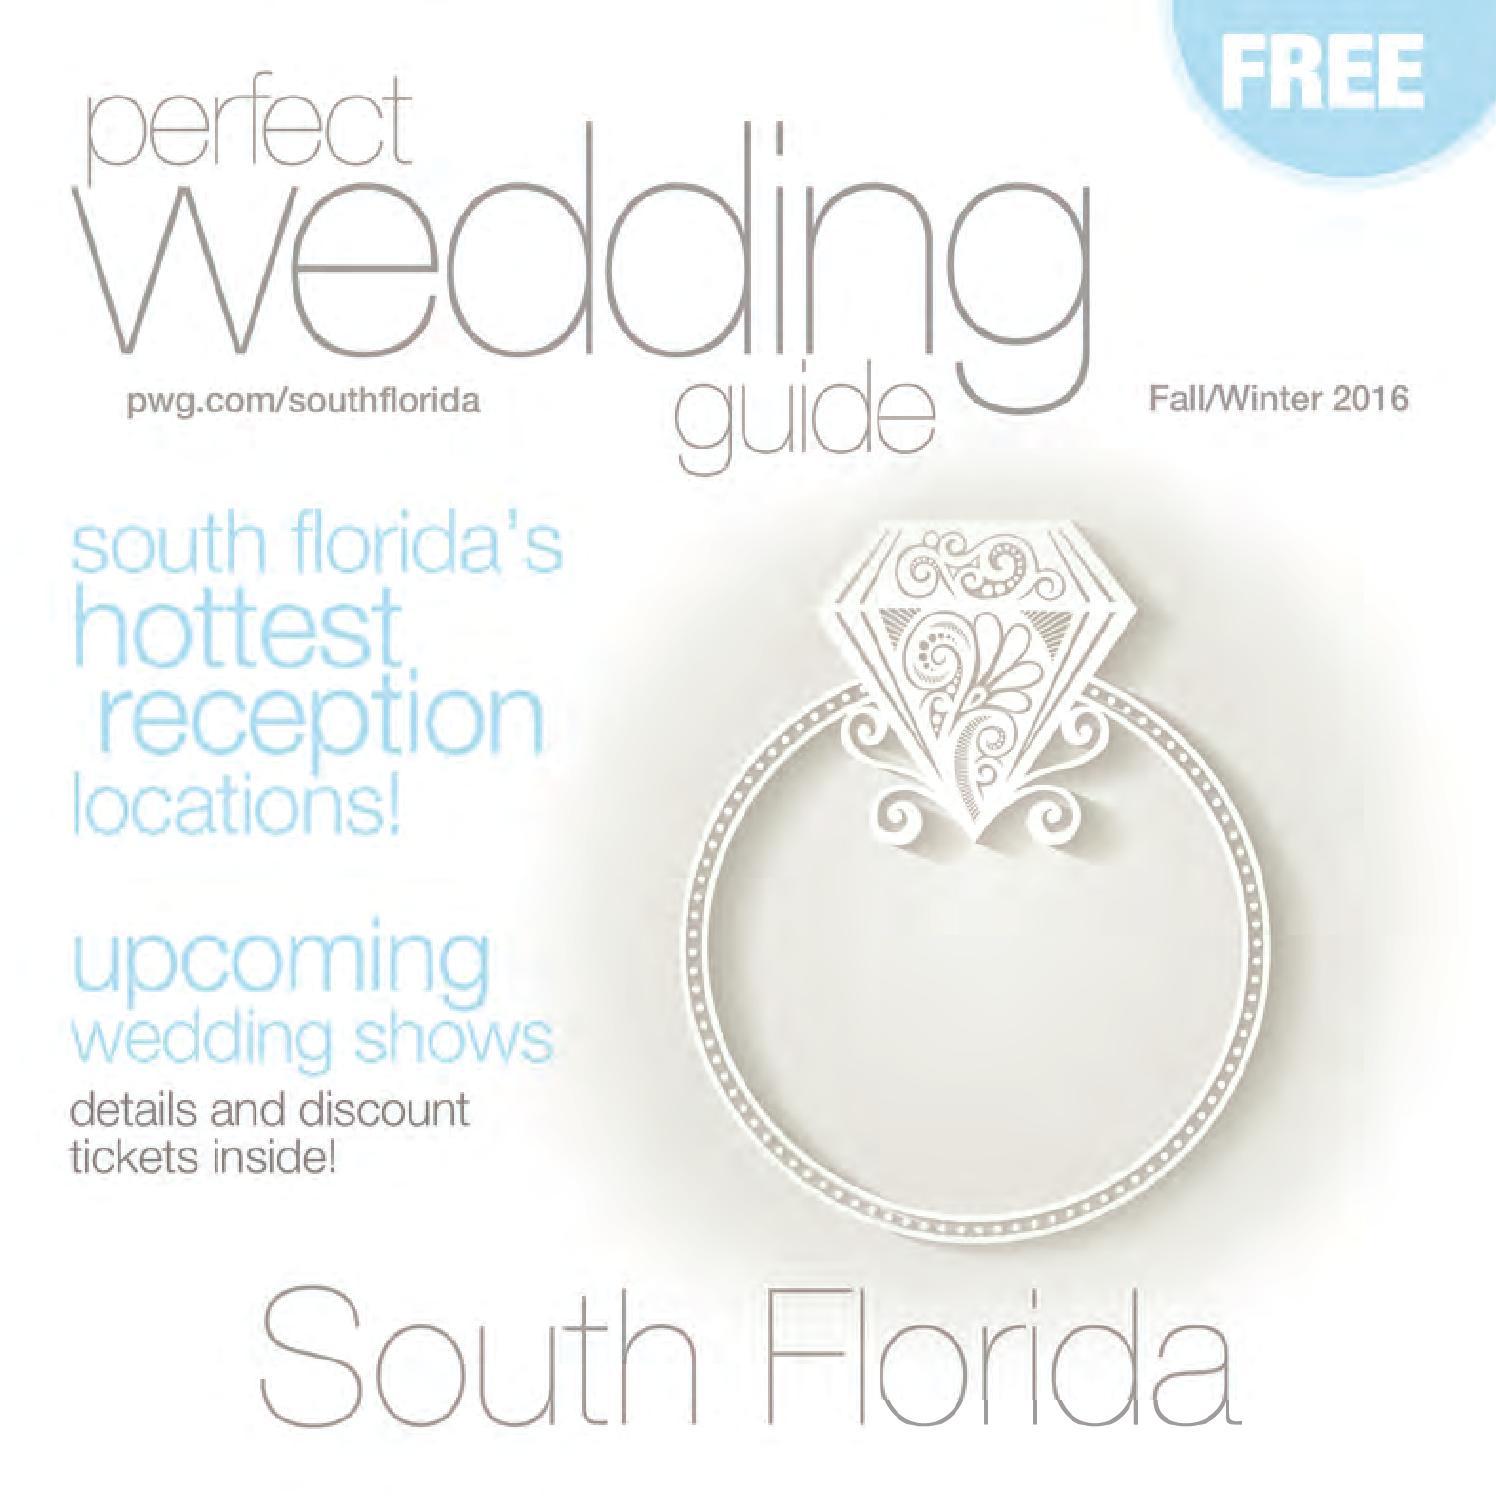 ec397719f1f963 Perfect Wedding Guide South Florida Fall/Winter 2016 by Rick Caldwell -  issuu